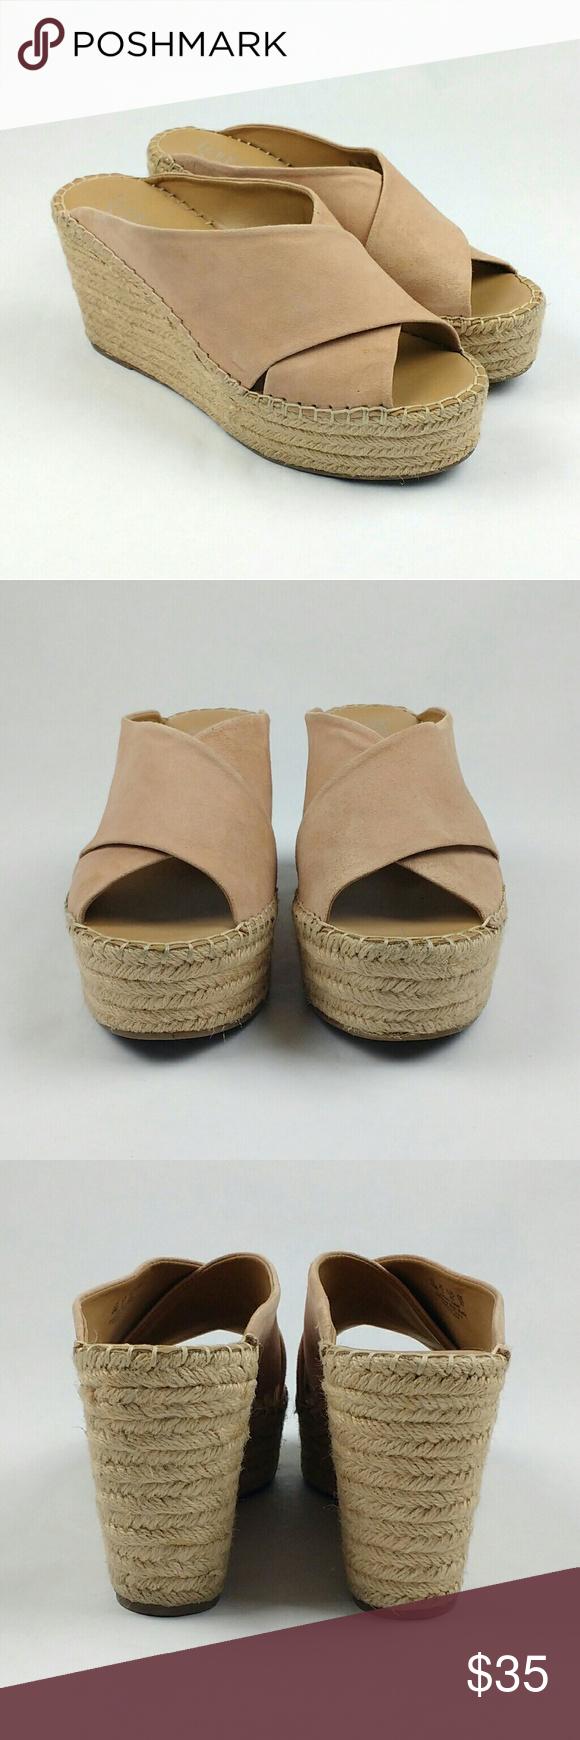 1e02c26c3cbd Franco Sarto Tiffany Wedge Sandals Sz 10 Franco Sarto wedge sandals in good  condition. Pre